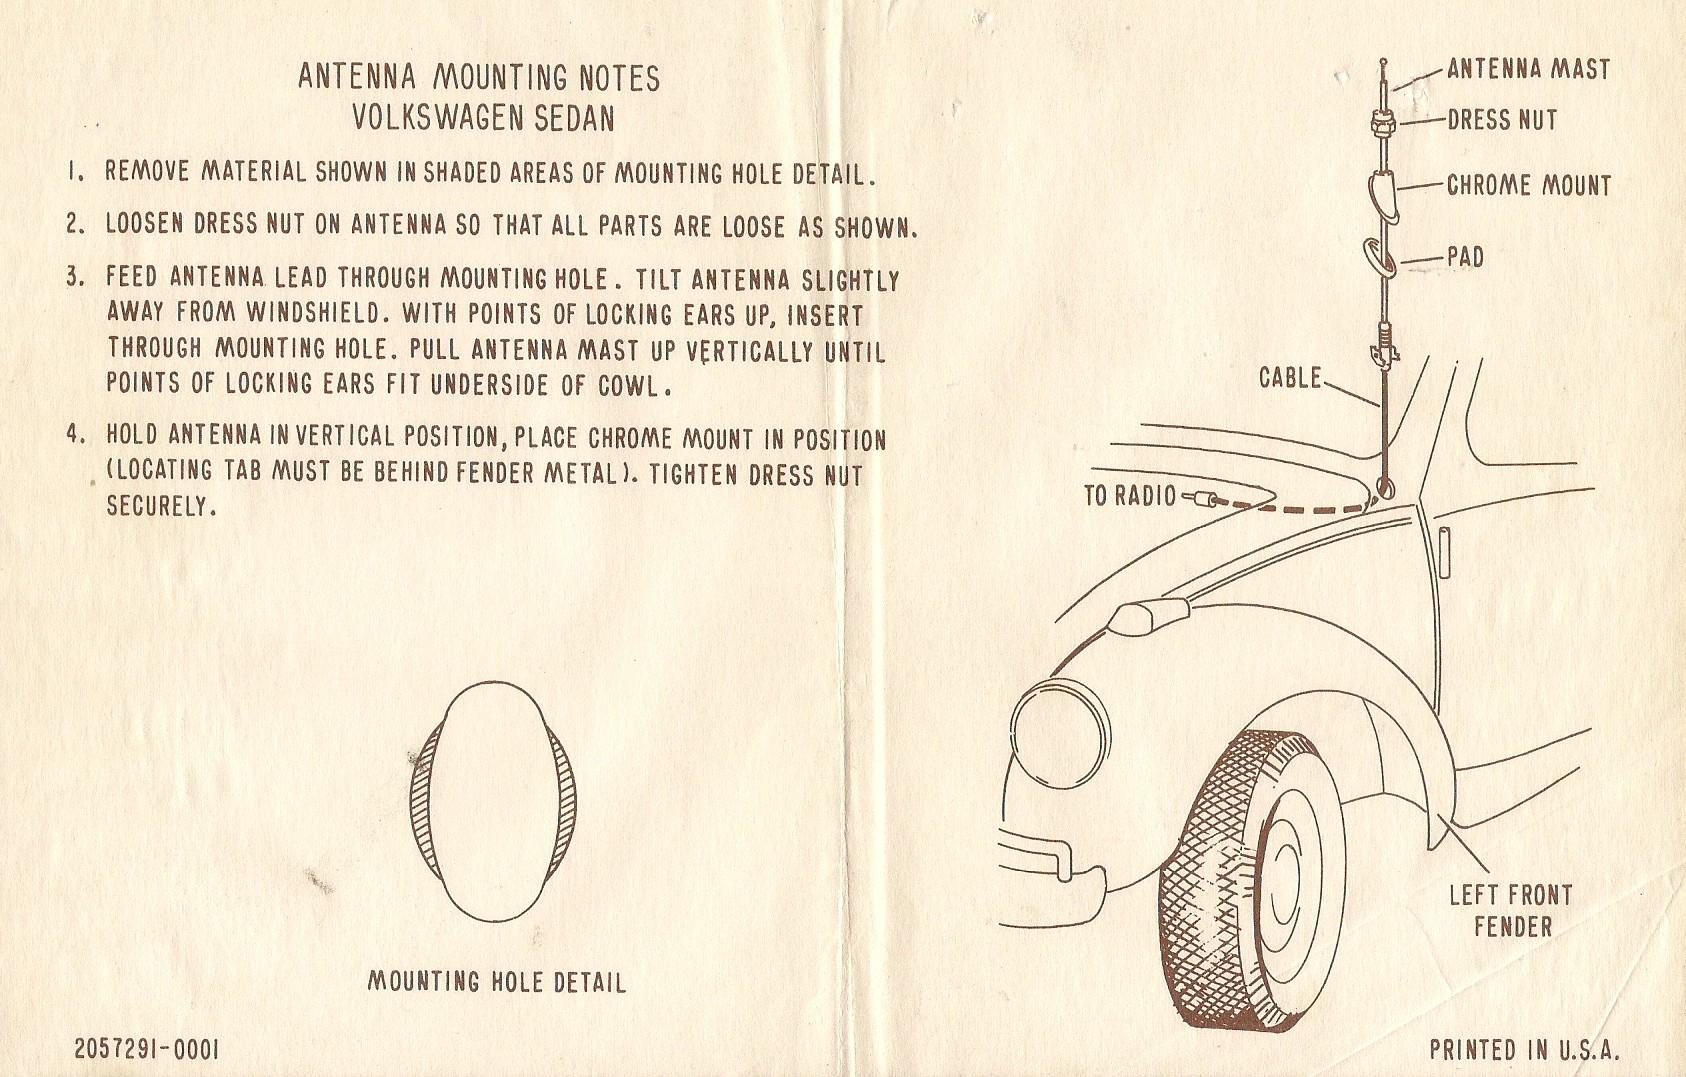 Bendix Wiring Schematic Diagram Electronic Kt76a 67 Volkswagen Beetle Am Sapphire V Radio 1967 Vw Beetlerh1967beetle At Selfit